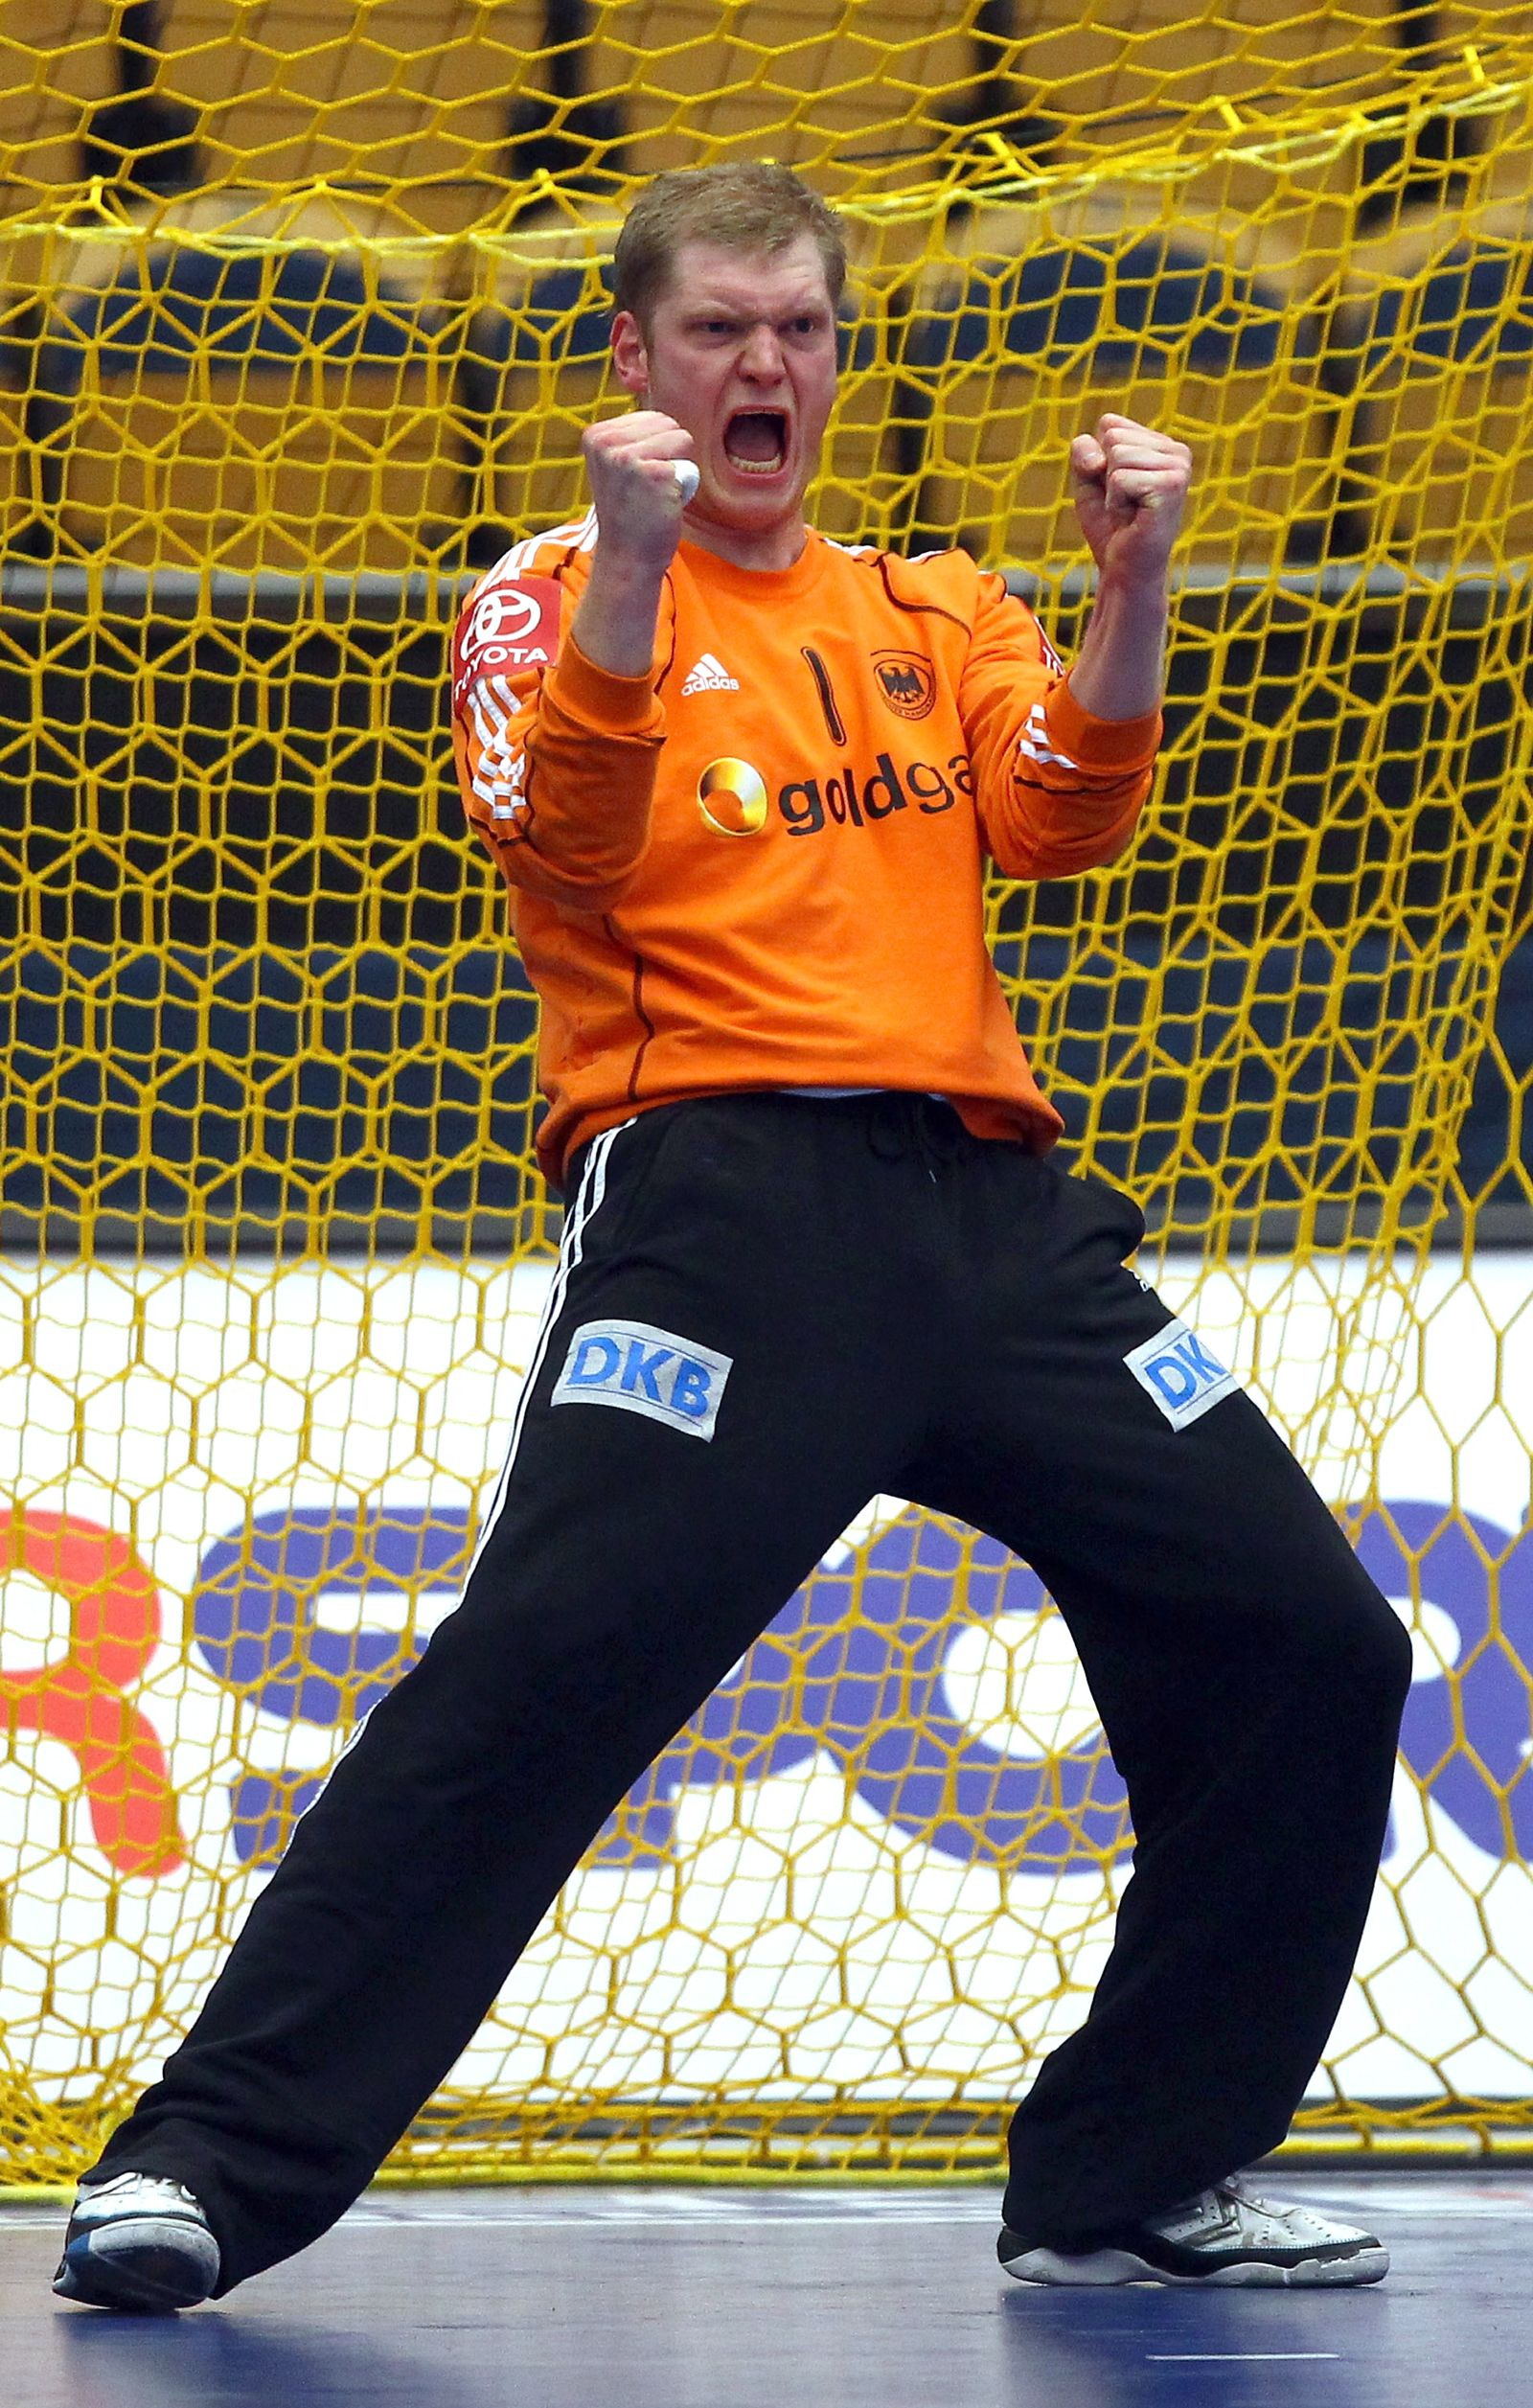 Johannes Bitter / Handball